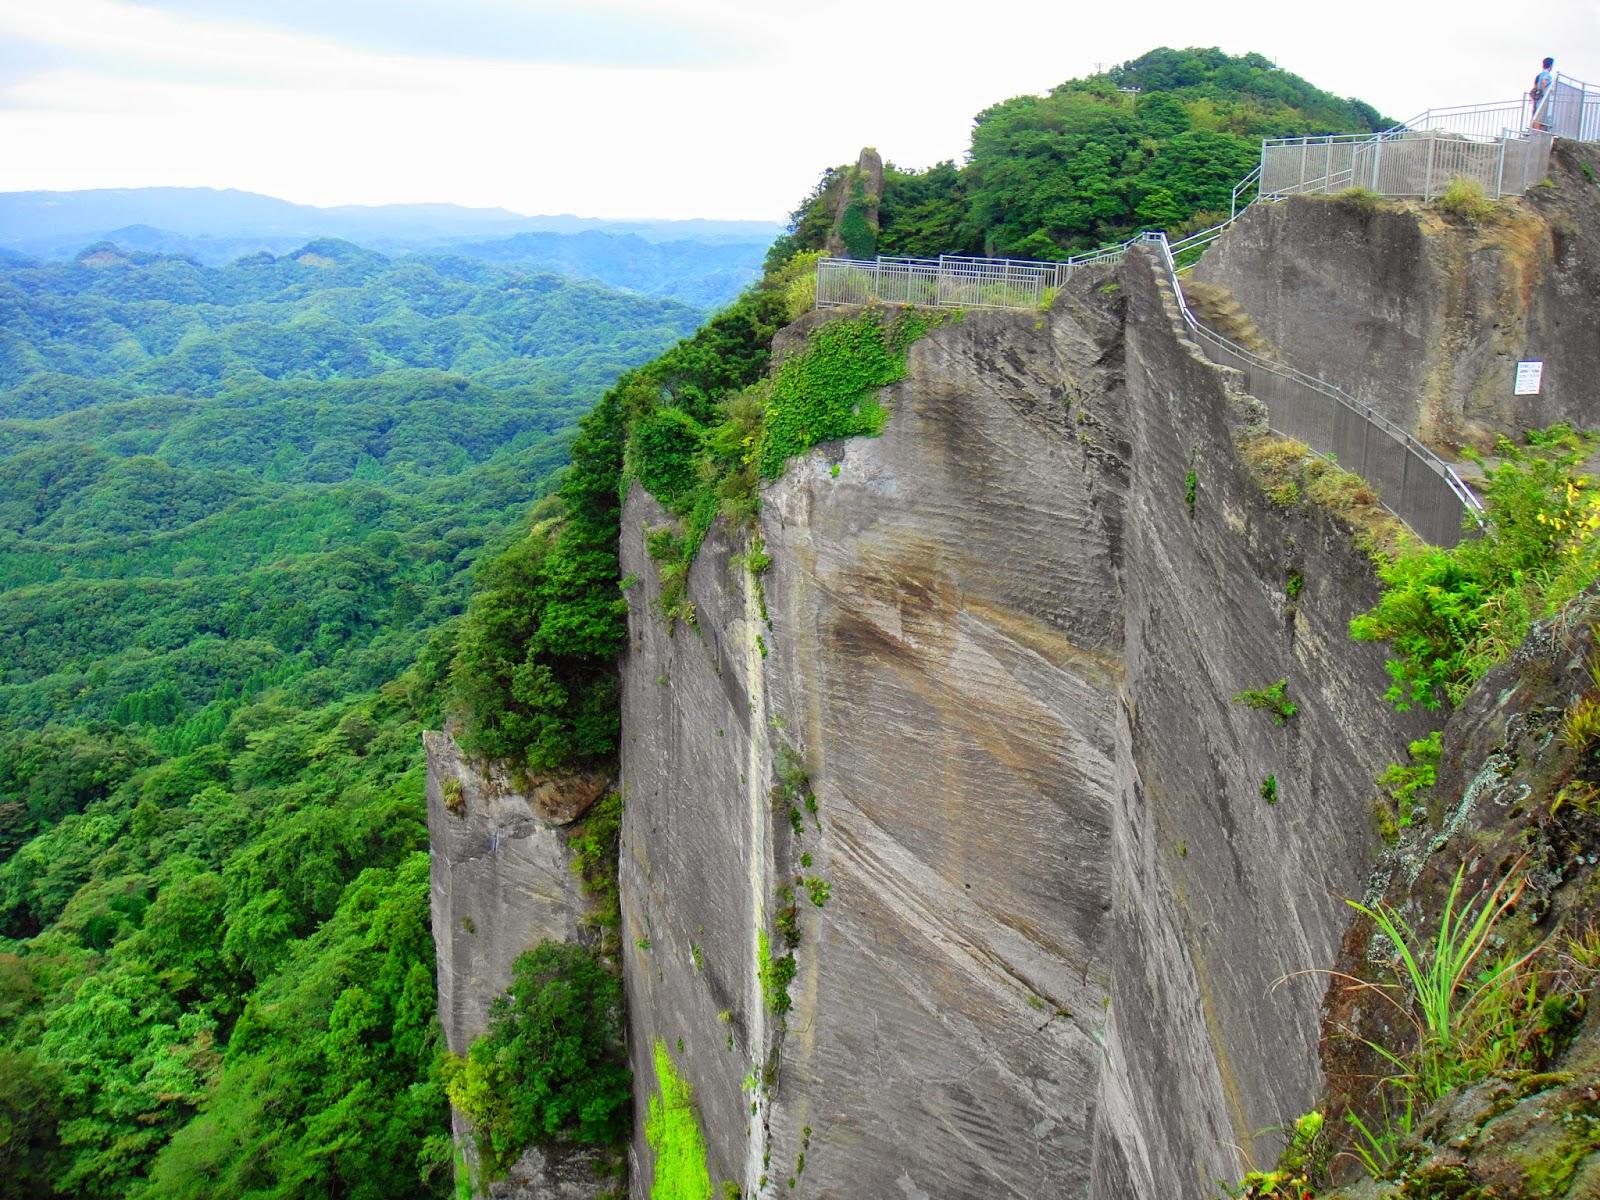 A deep ravine